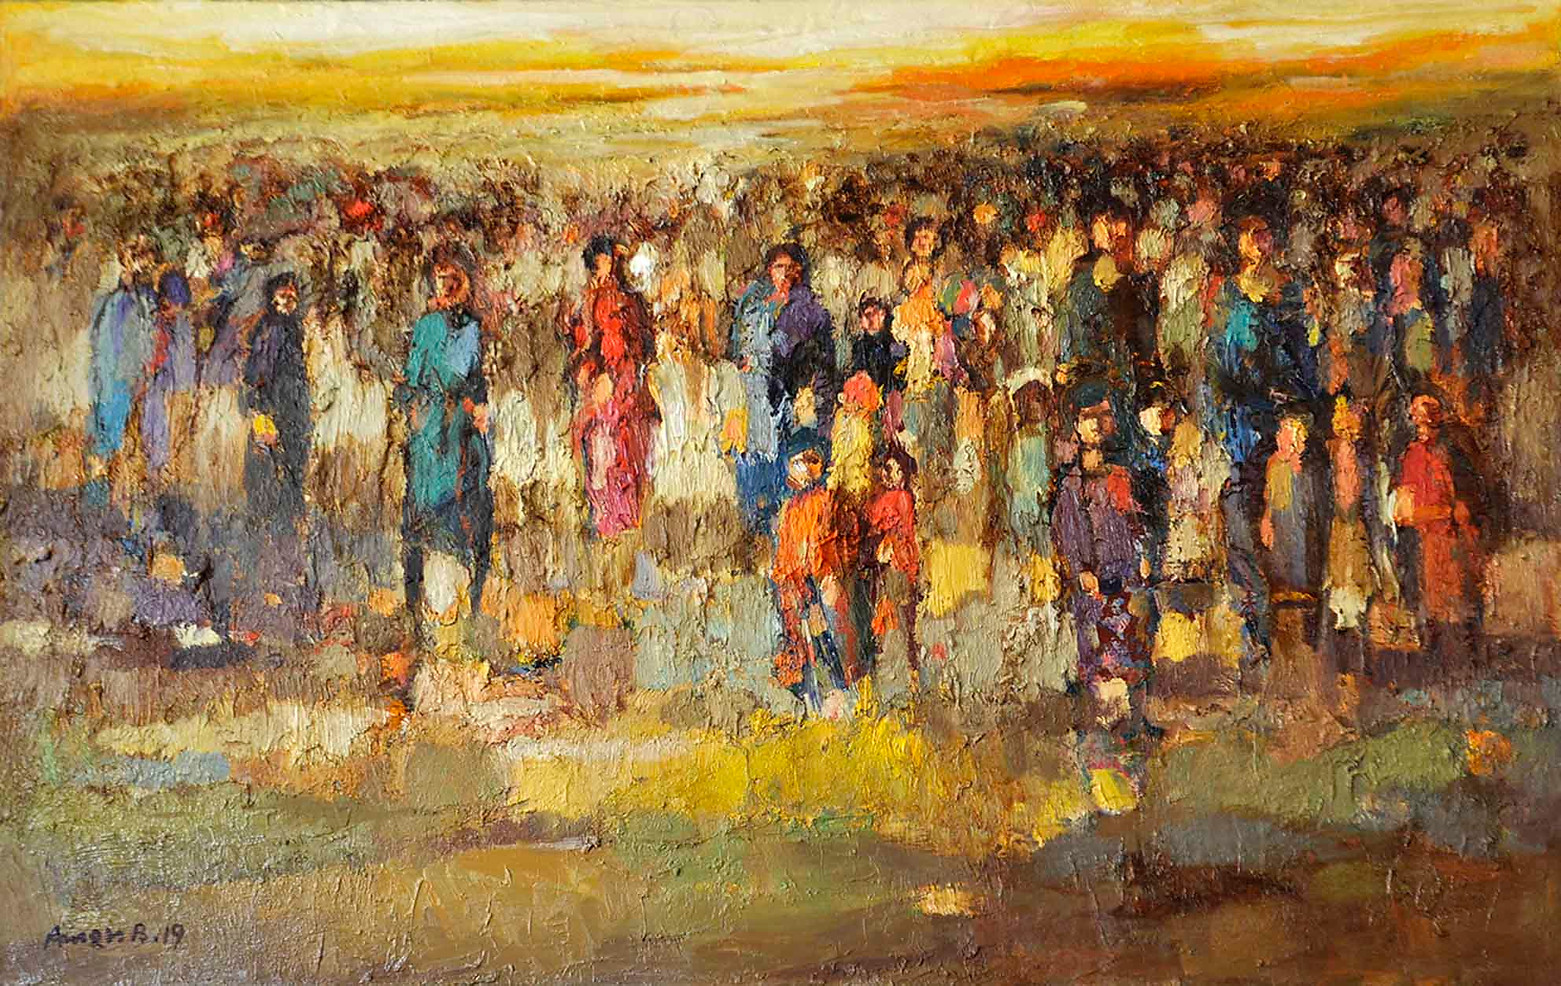 110 x 70 cm  ,  Oil on canvas  ,   2019